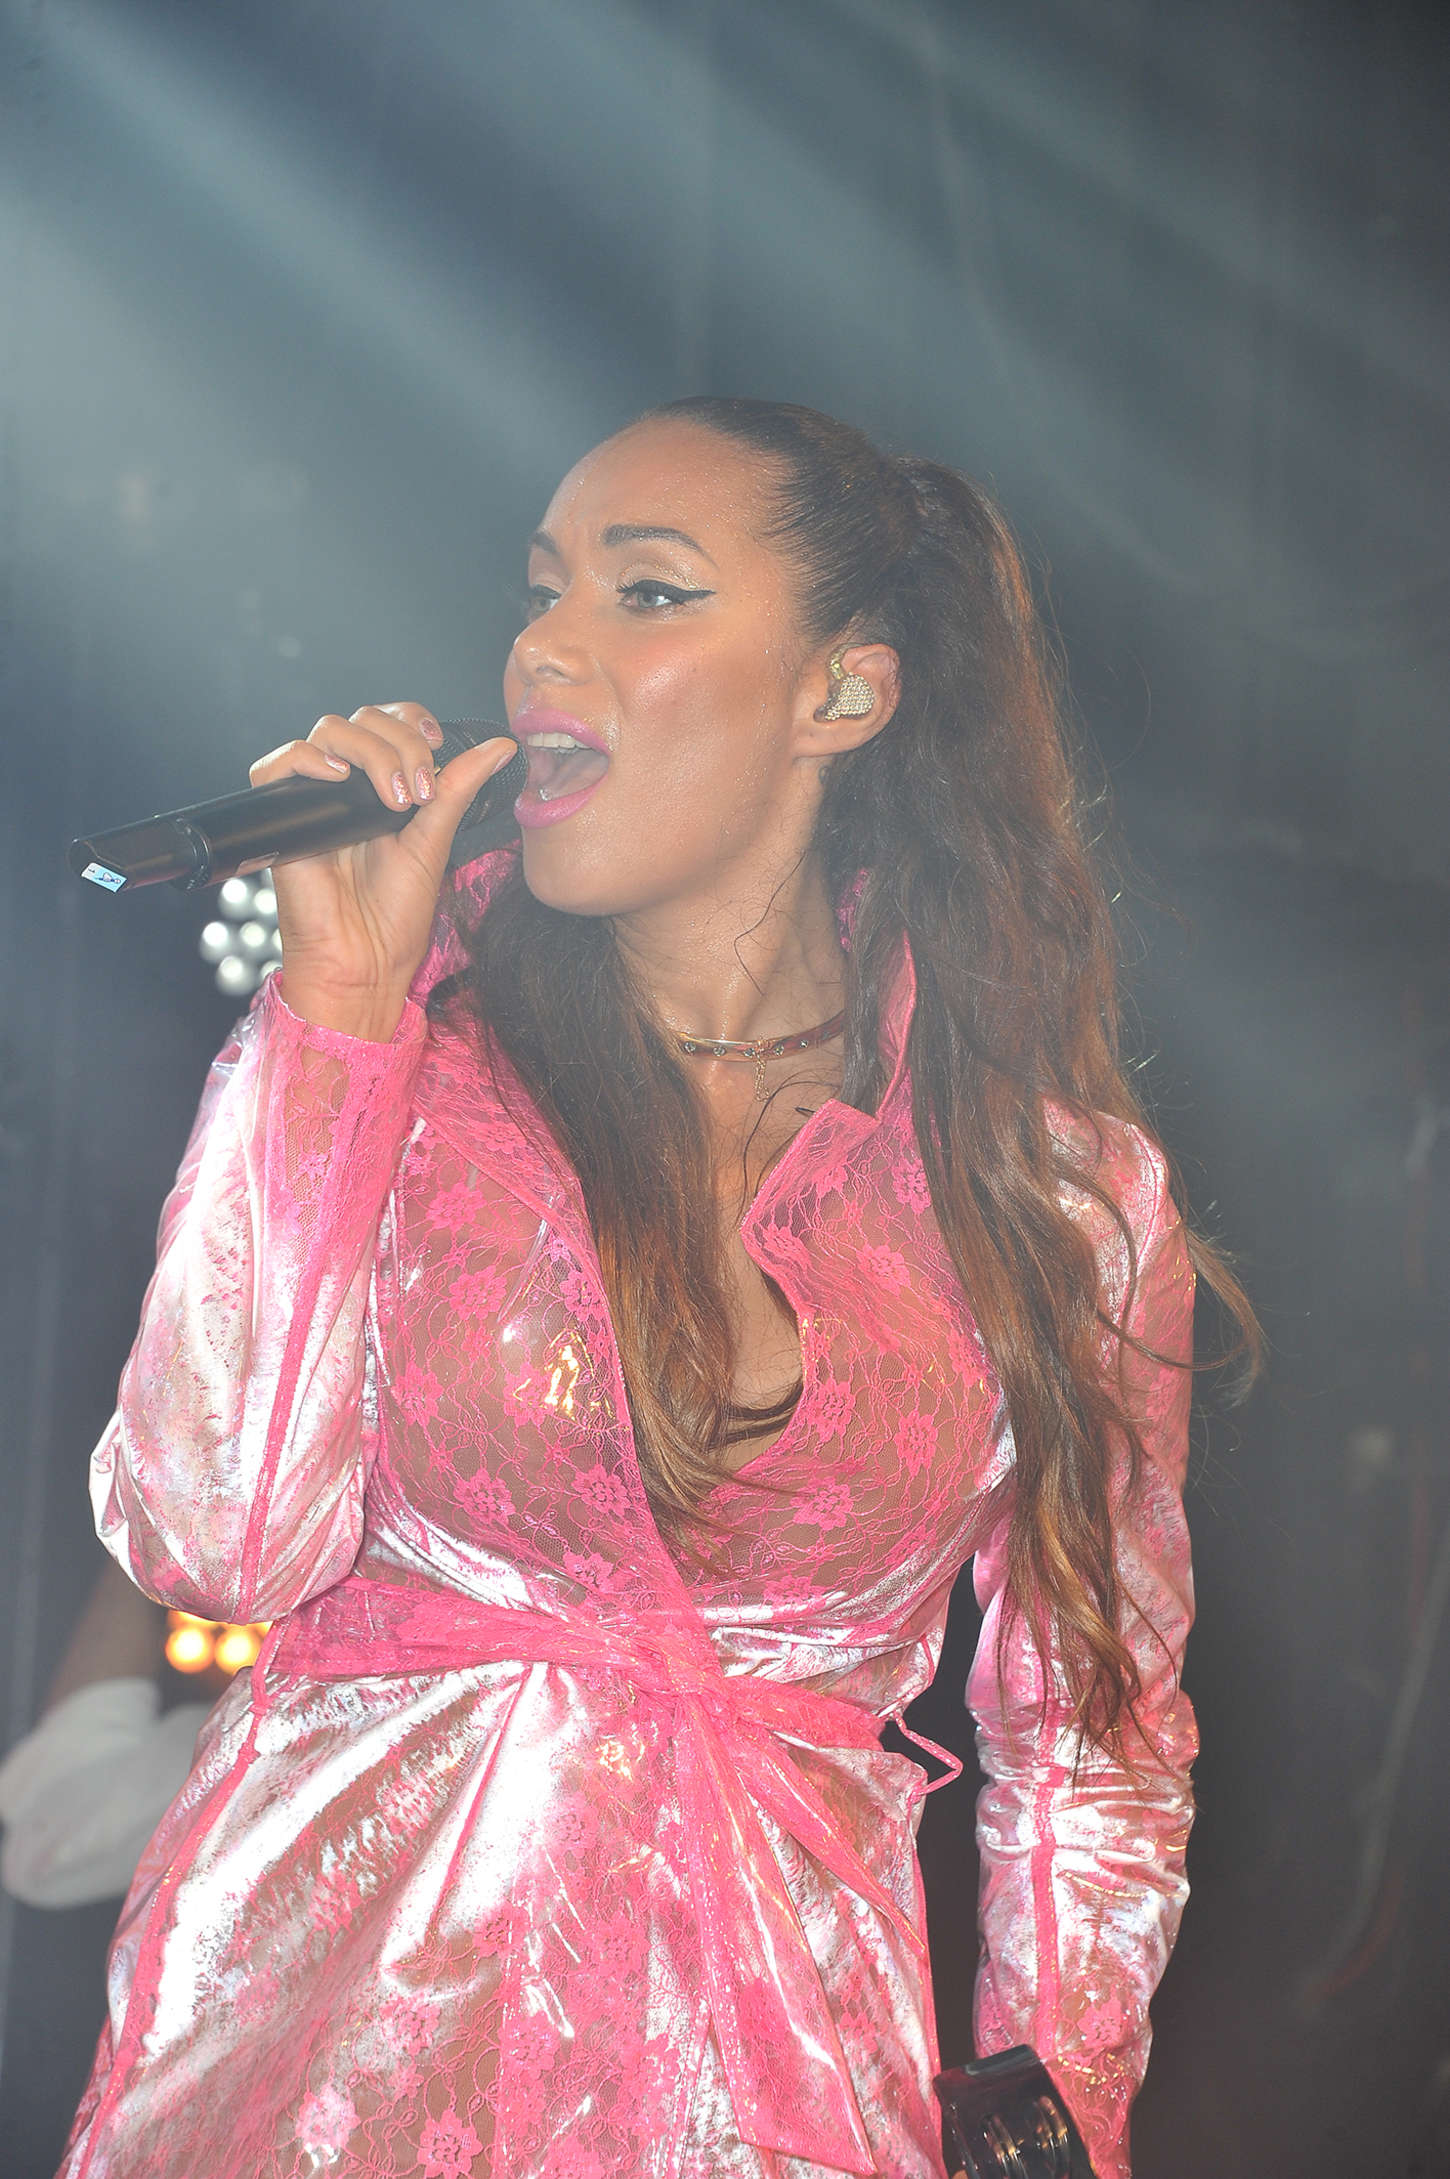 Leona Lewis - Performing at G.A.Y Nightclub in London